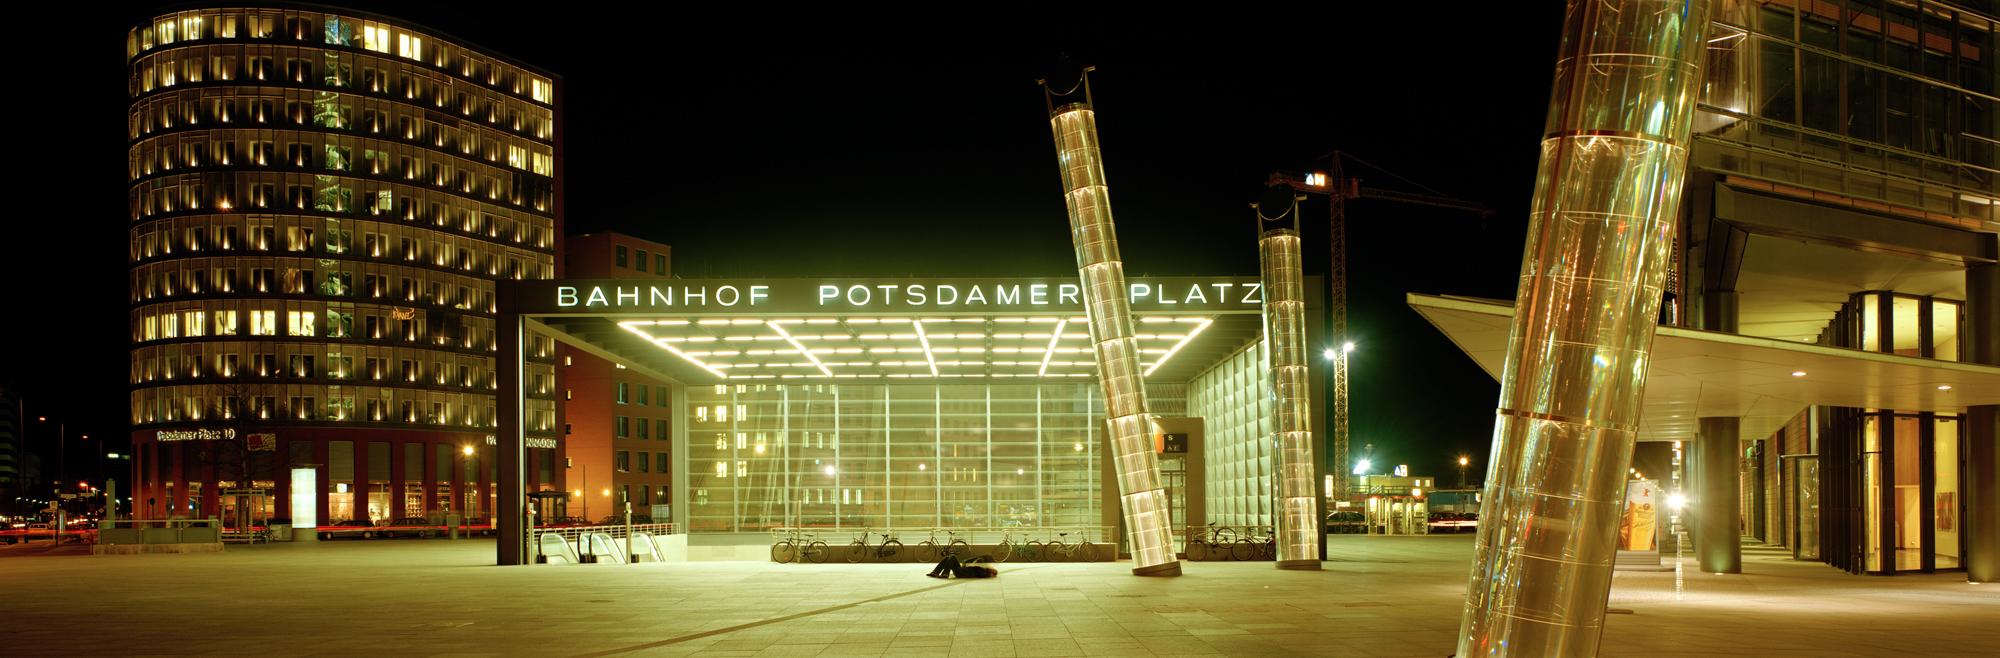 large format photography, Grossformatfotografie, Grossformatphotographie, Fotografie, Photographie, photography, 6x17, Berlin, Hauptstadt, capitol, city, Stadt, Architektur, architecture, Beton, Stahl, concrete, steel, Potsdamer Platz, U-Bahn, Metro, Nacht, Night, Lichter, Lights